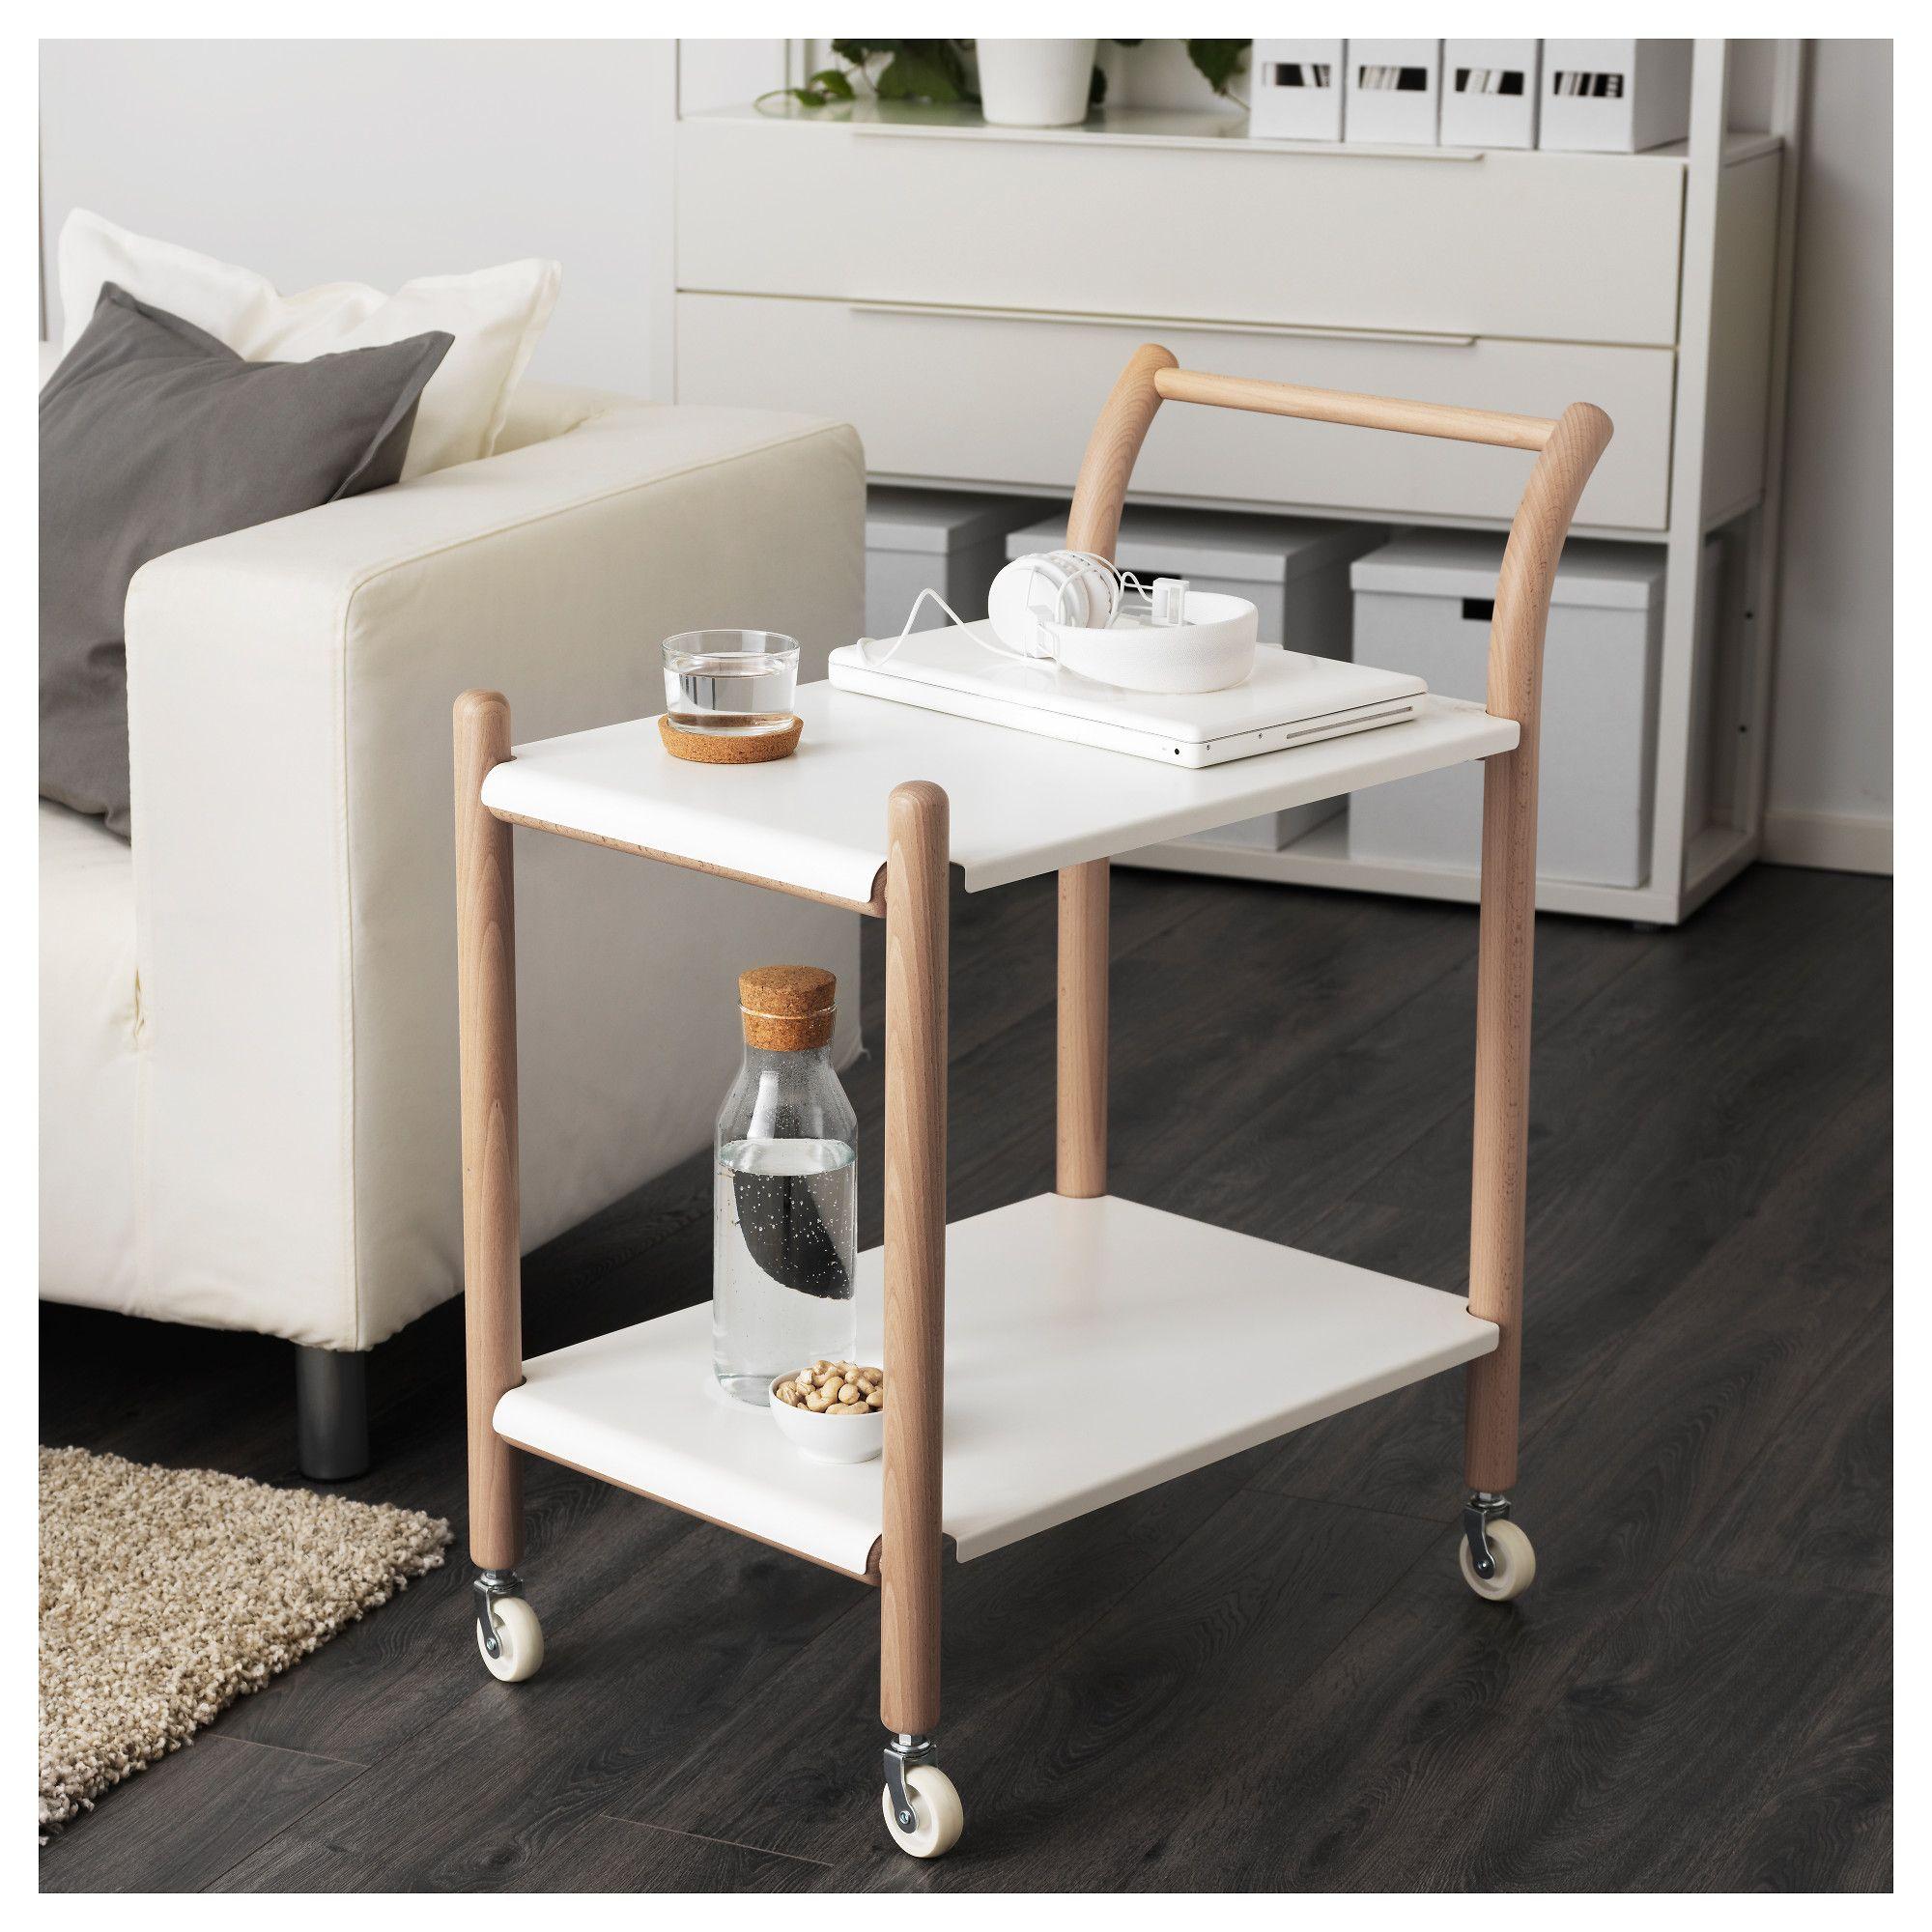 Fresh Home Furnishing Ideas And Affordable Furniture Ikea Ps Ikea Living Room Ikea